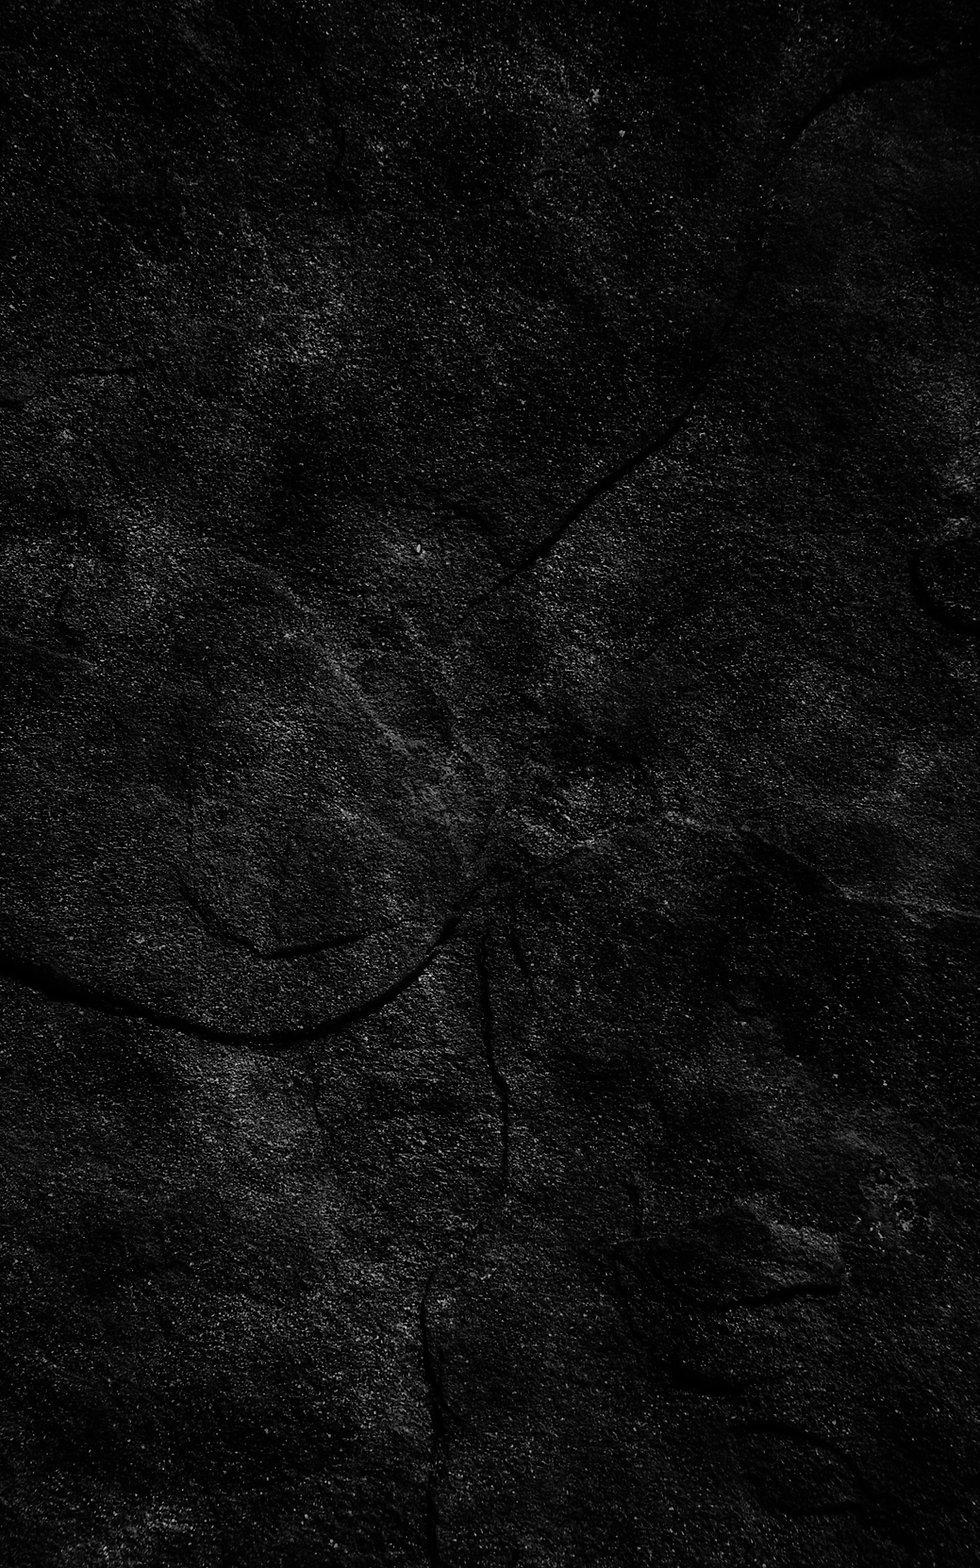 vert 4k-black-stone-background-cracked-s